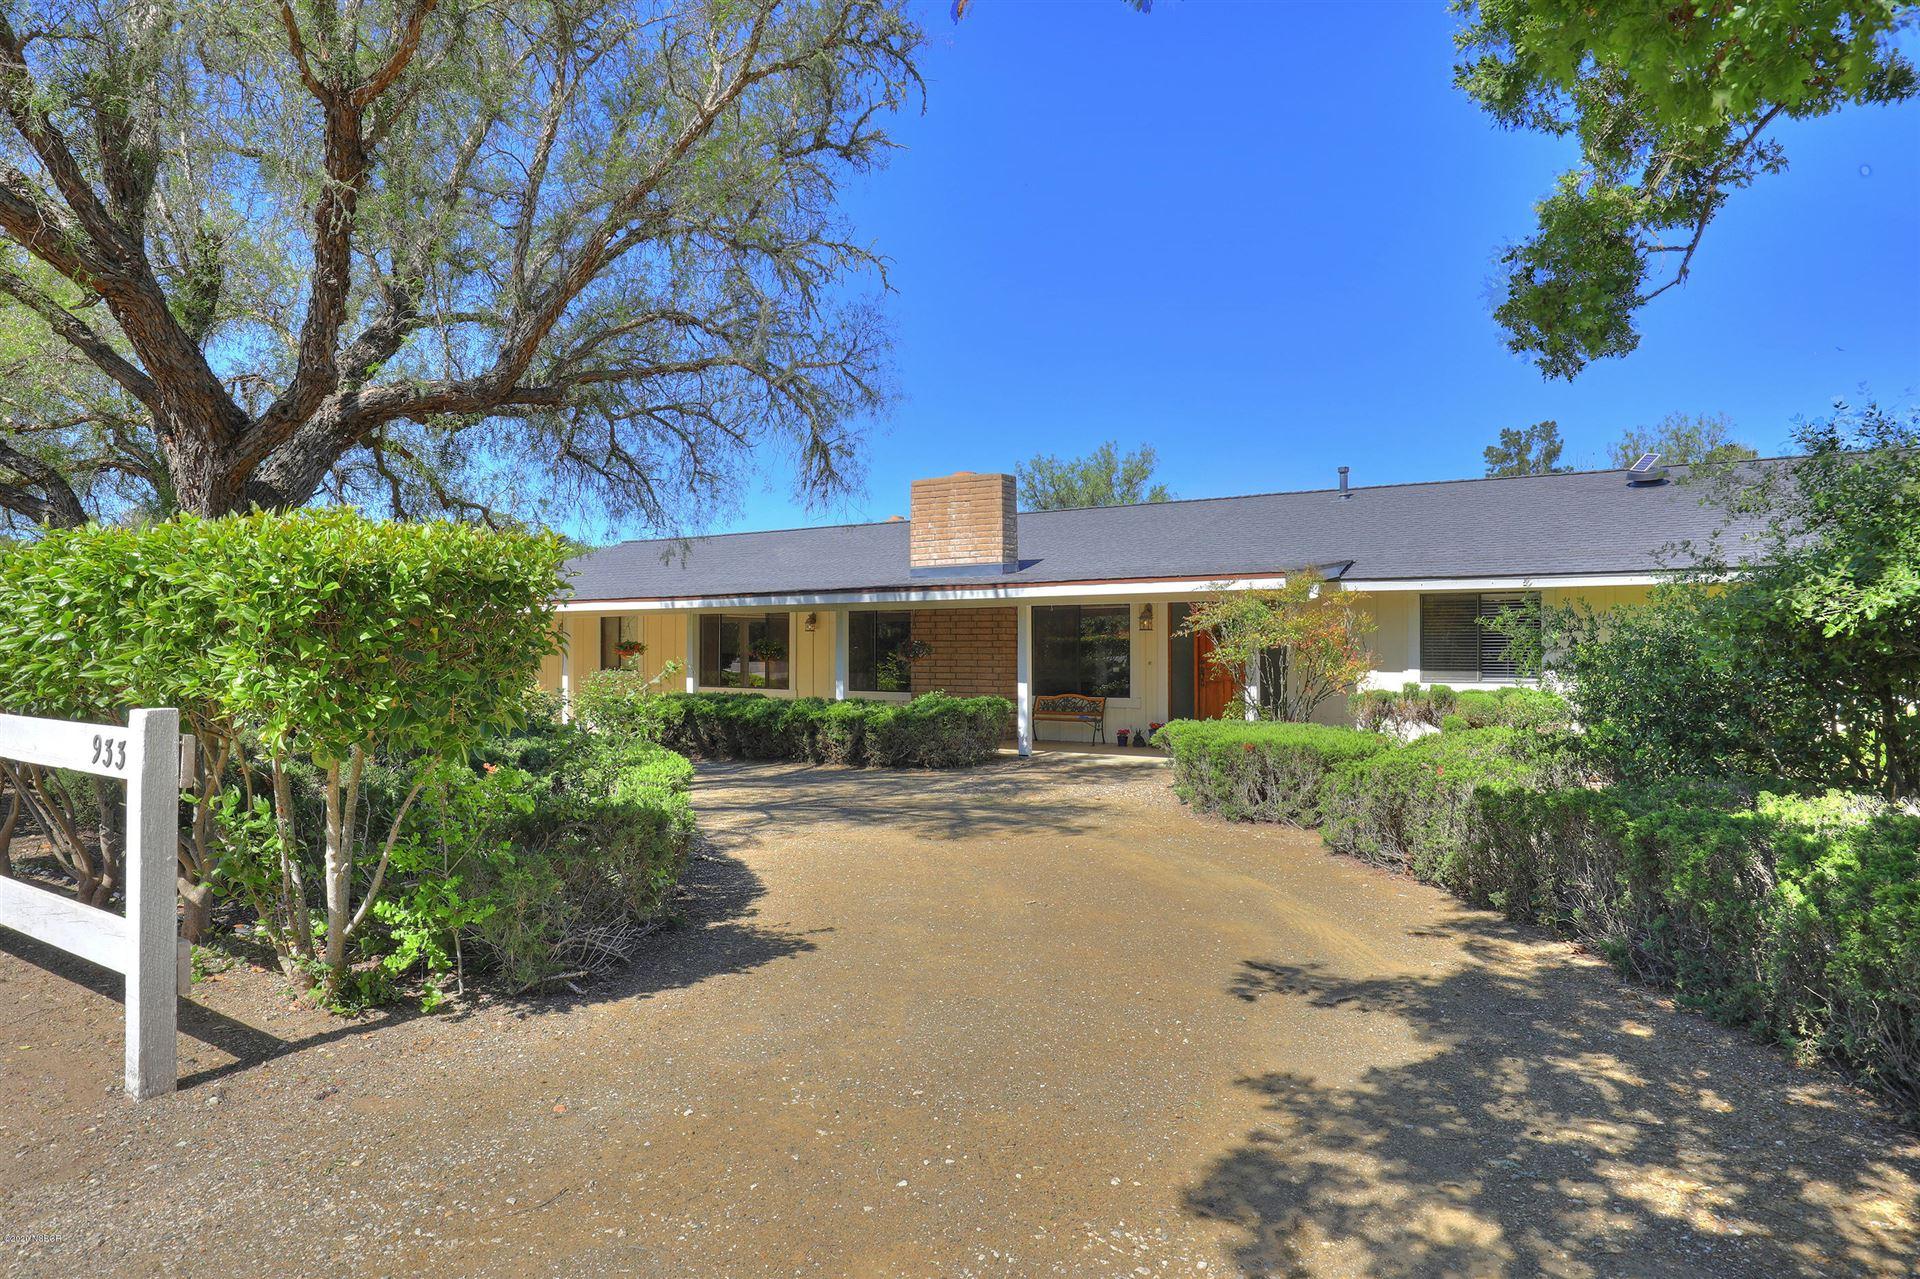 933 Old Ranch Road, Solvang, CA 93463 - #: 20000909